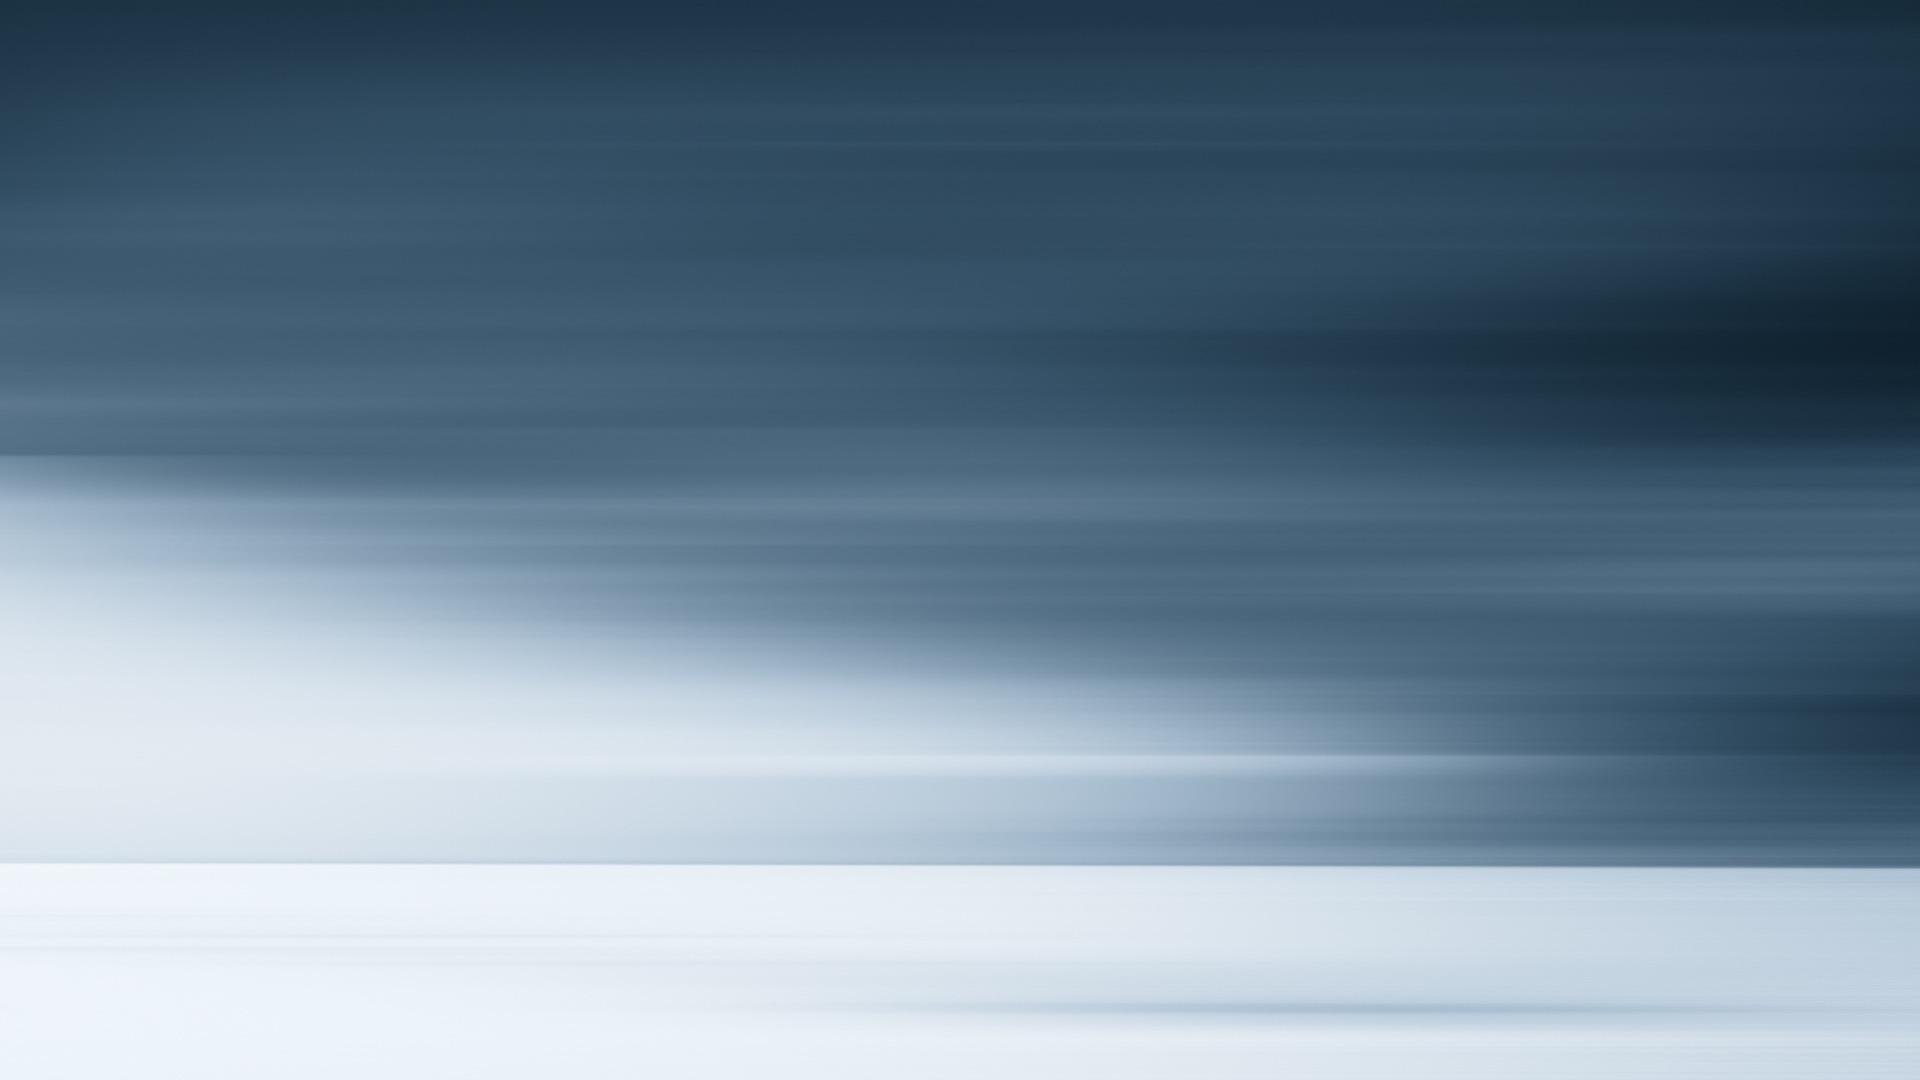 Surface Pro Wallpaper 1920x1080 Wallpapersafari